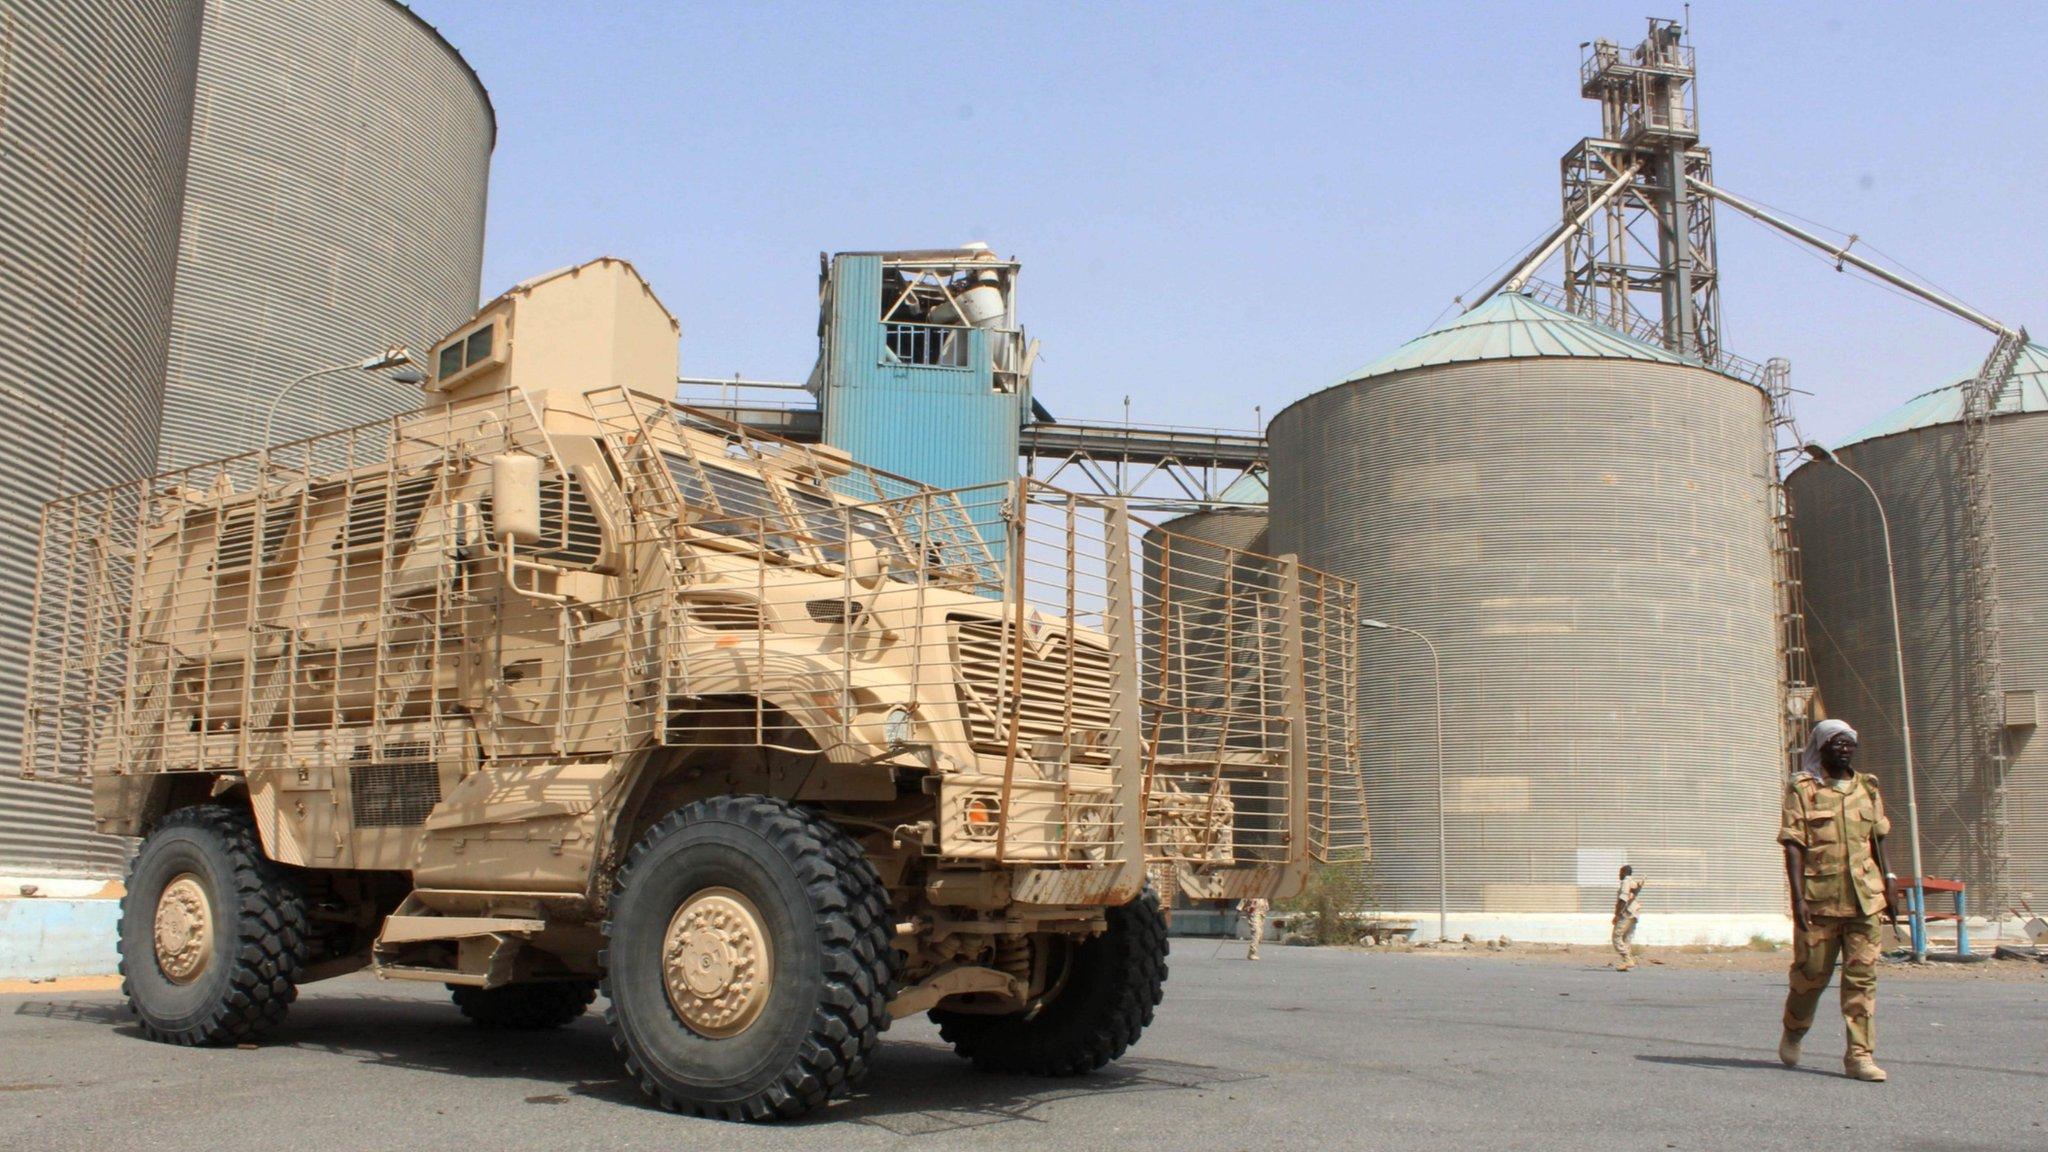 Yemen war: Grain stores in Hudaydah 'at risk of rotting'